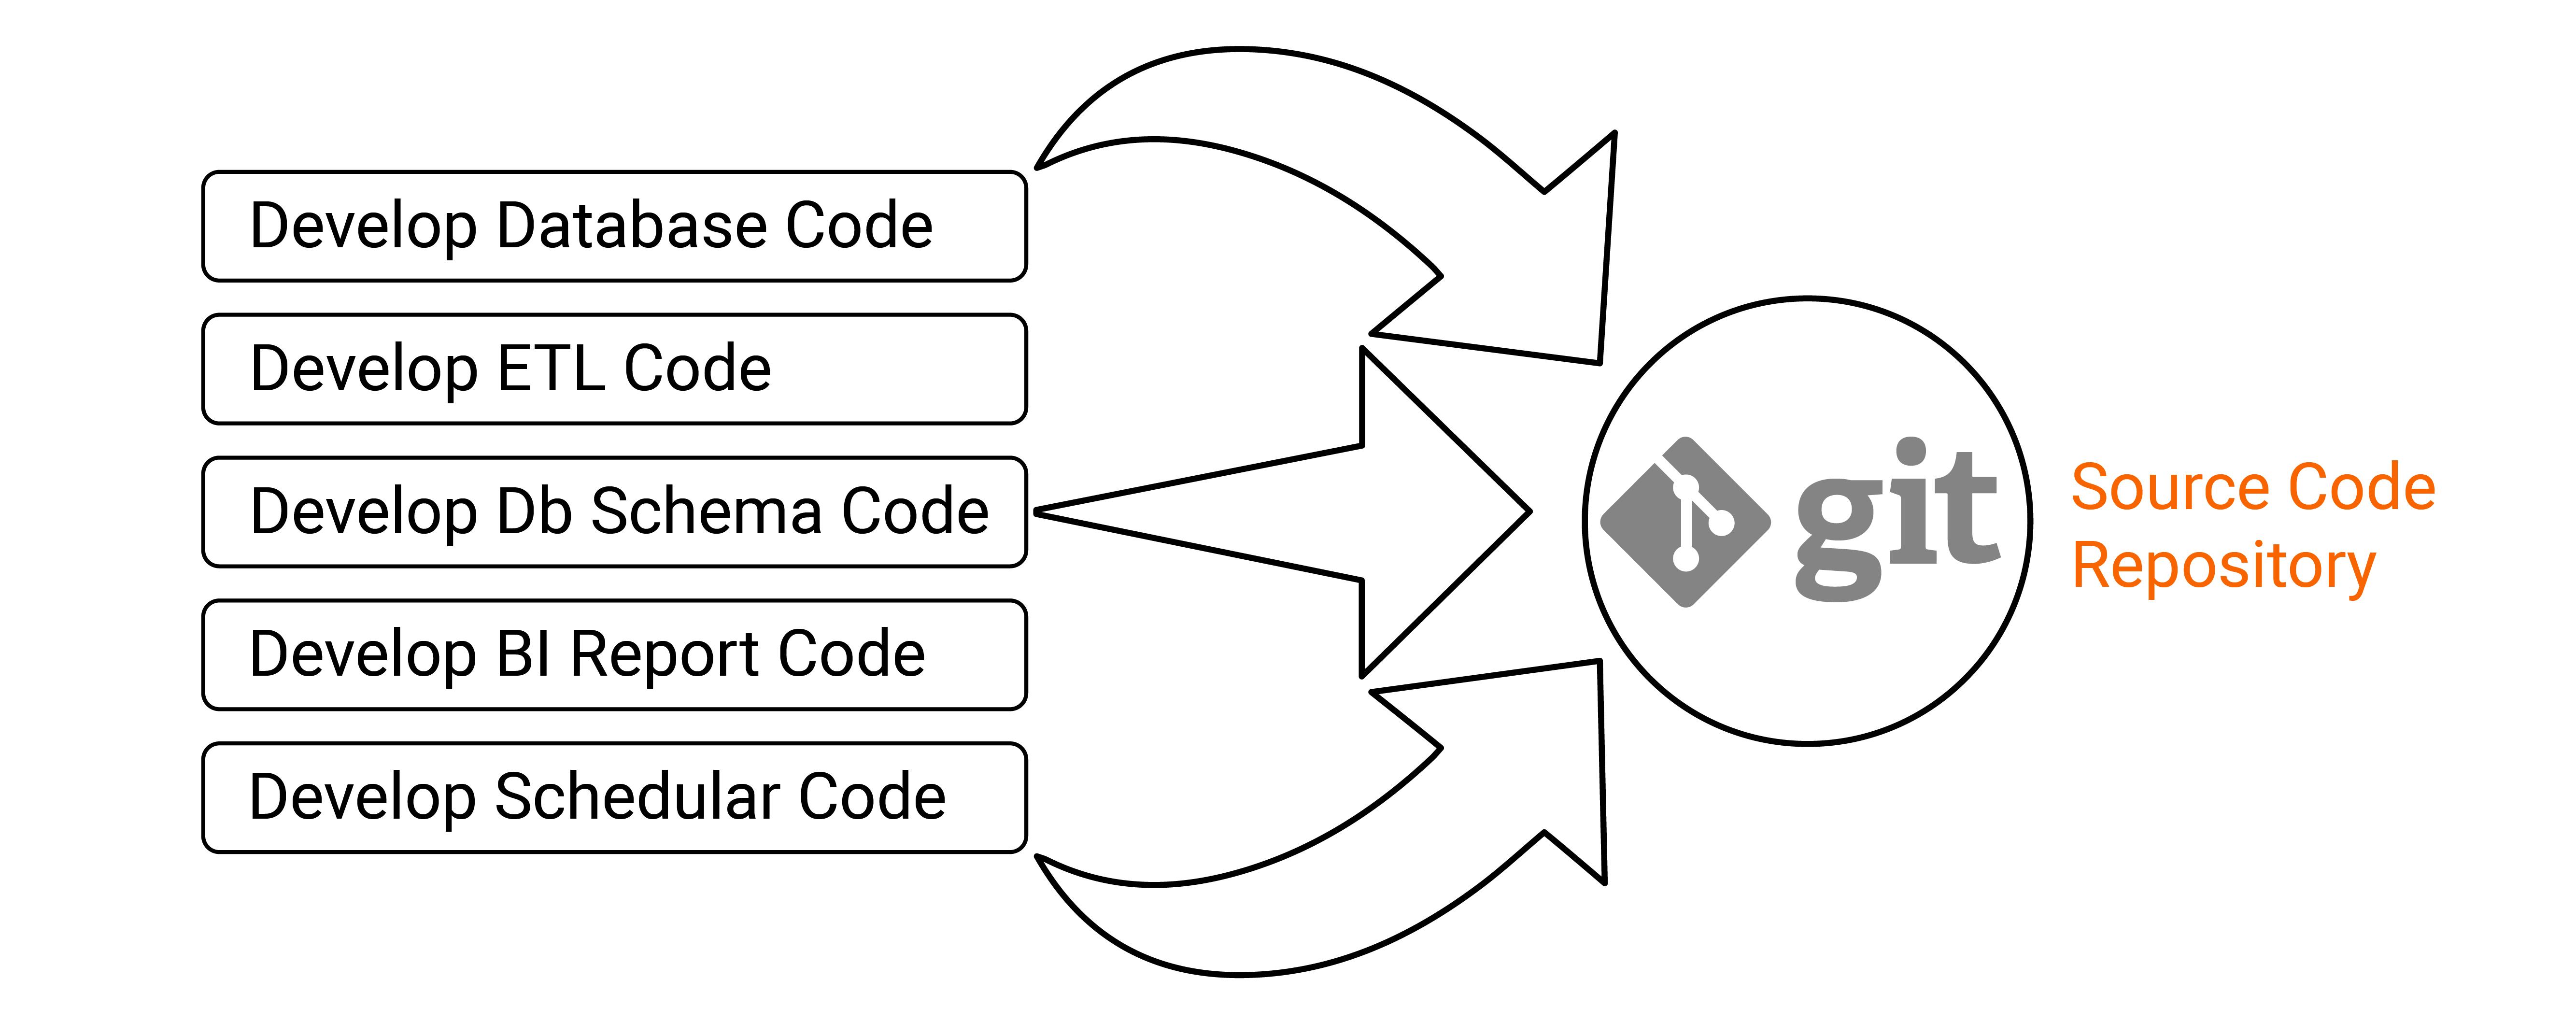 Source Code Repository-iCEDQ